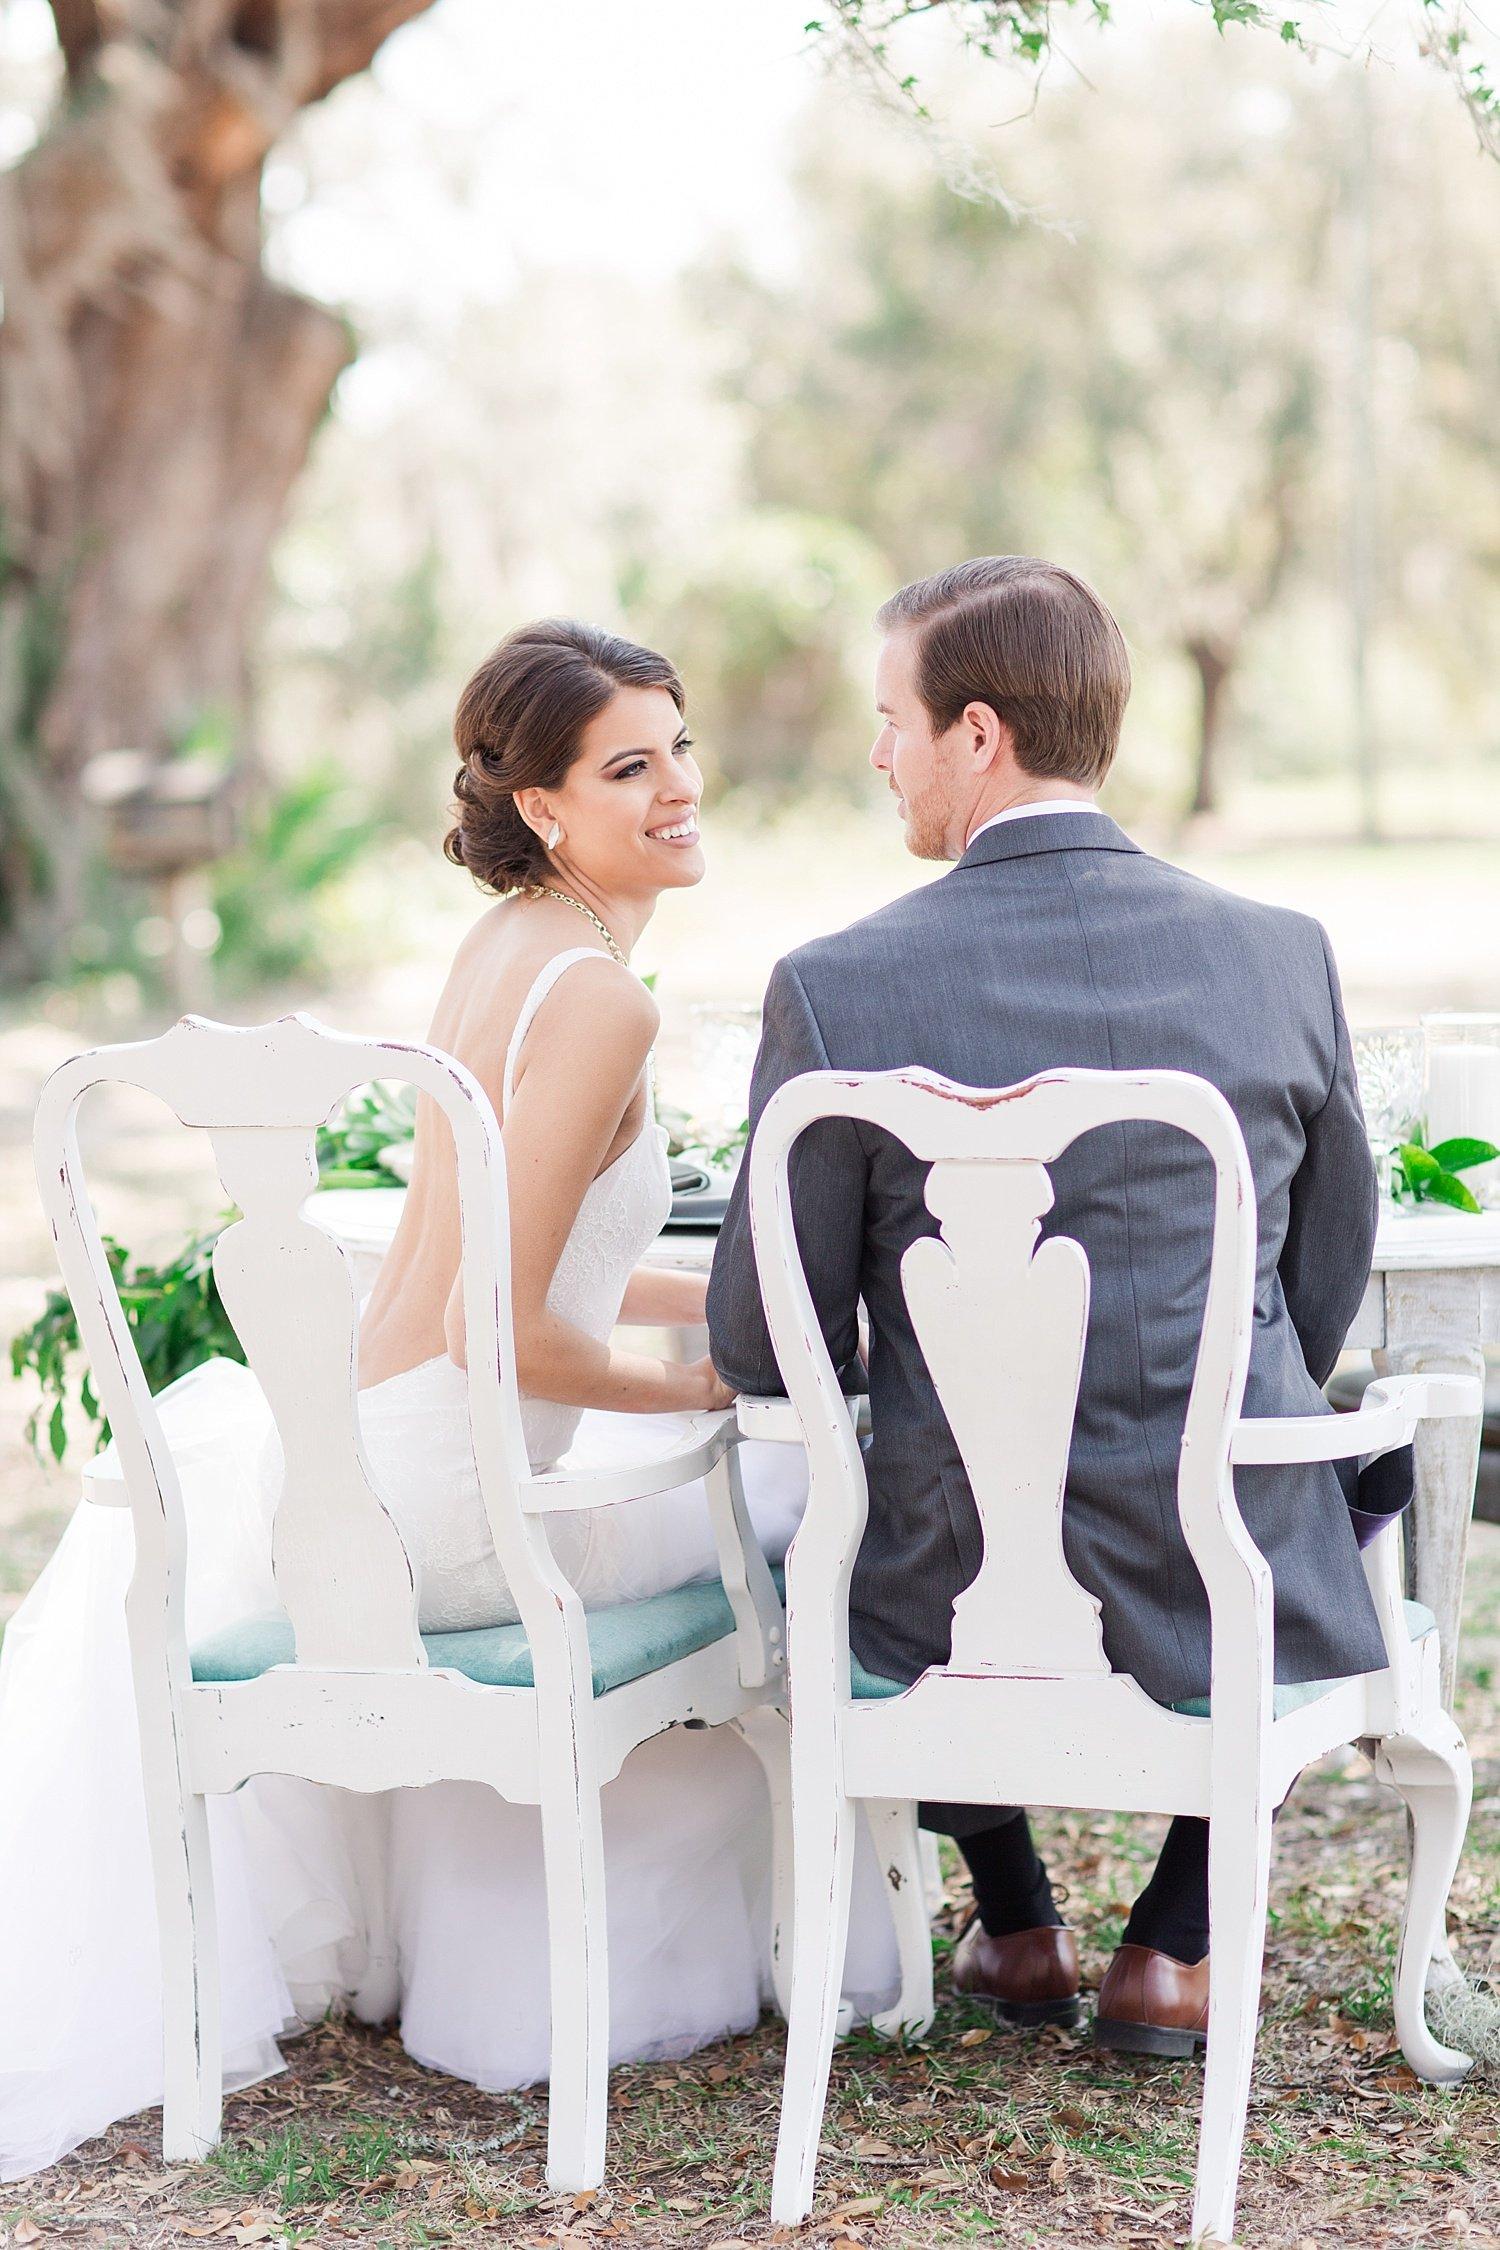 rachel-strickland-photography-katie-may-ivory-and-beau-bridal-boutique-bethesda-academy-wedding-whitfield-chapel-wedding-savannah-bridal-boutique-savannah-weddings-savannah-wedding-savannah-wedding-planner-savannah-bridal-gowns-savannah-bride-17.jpg